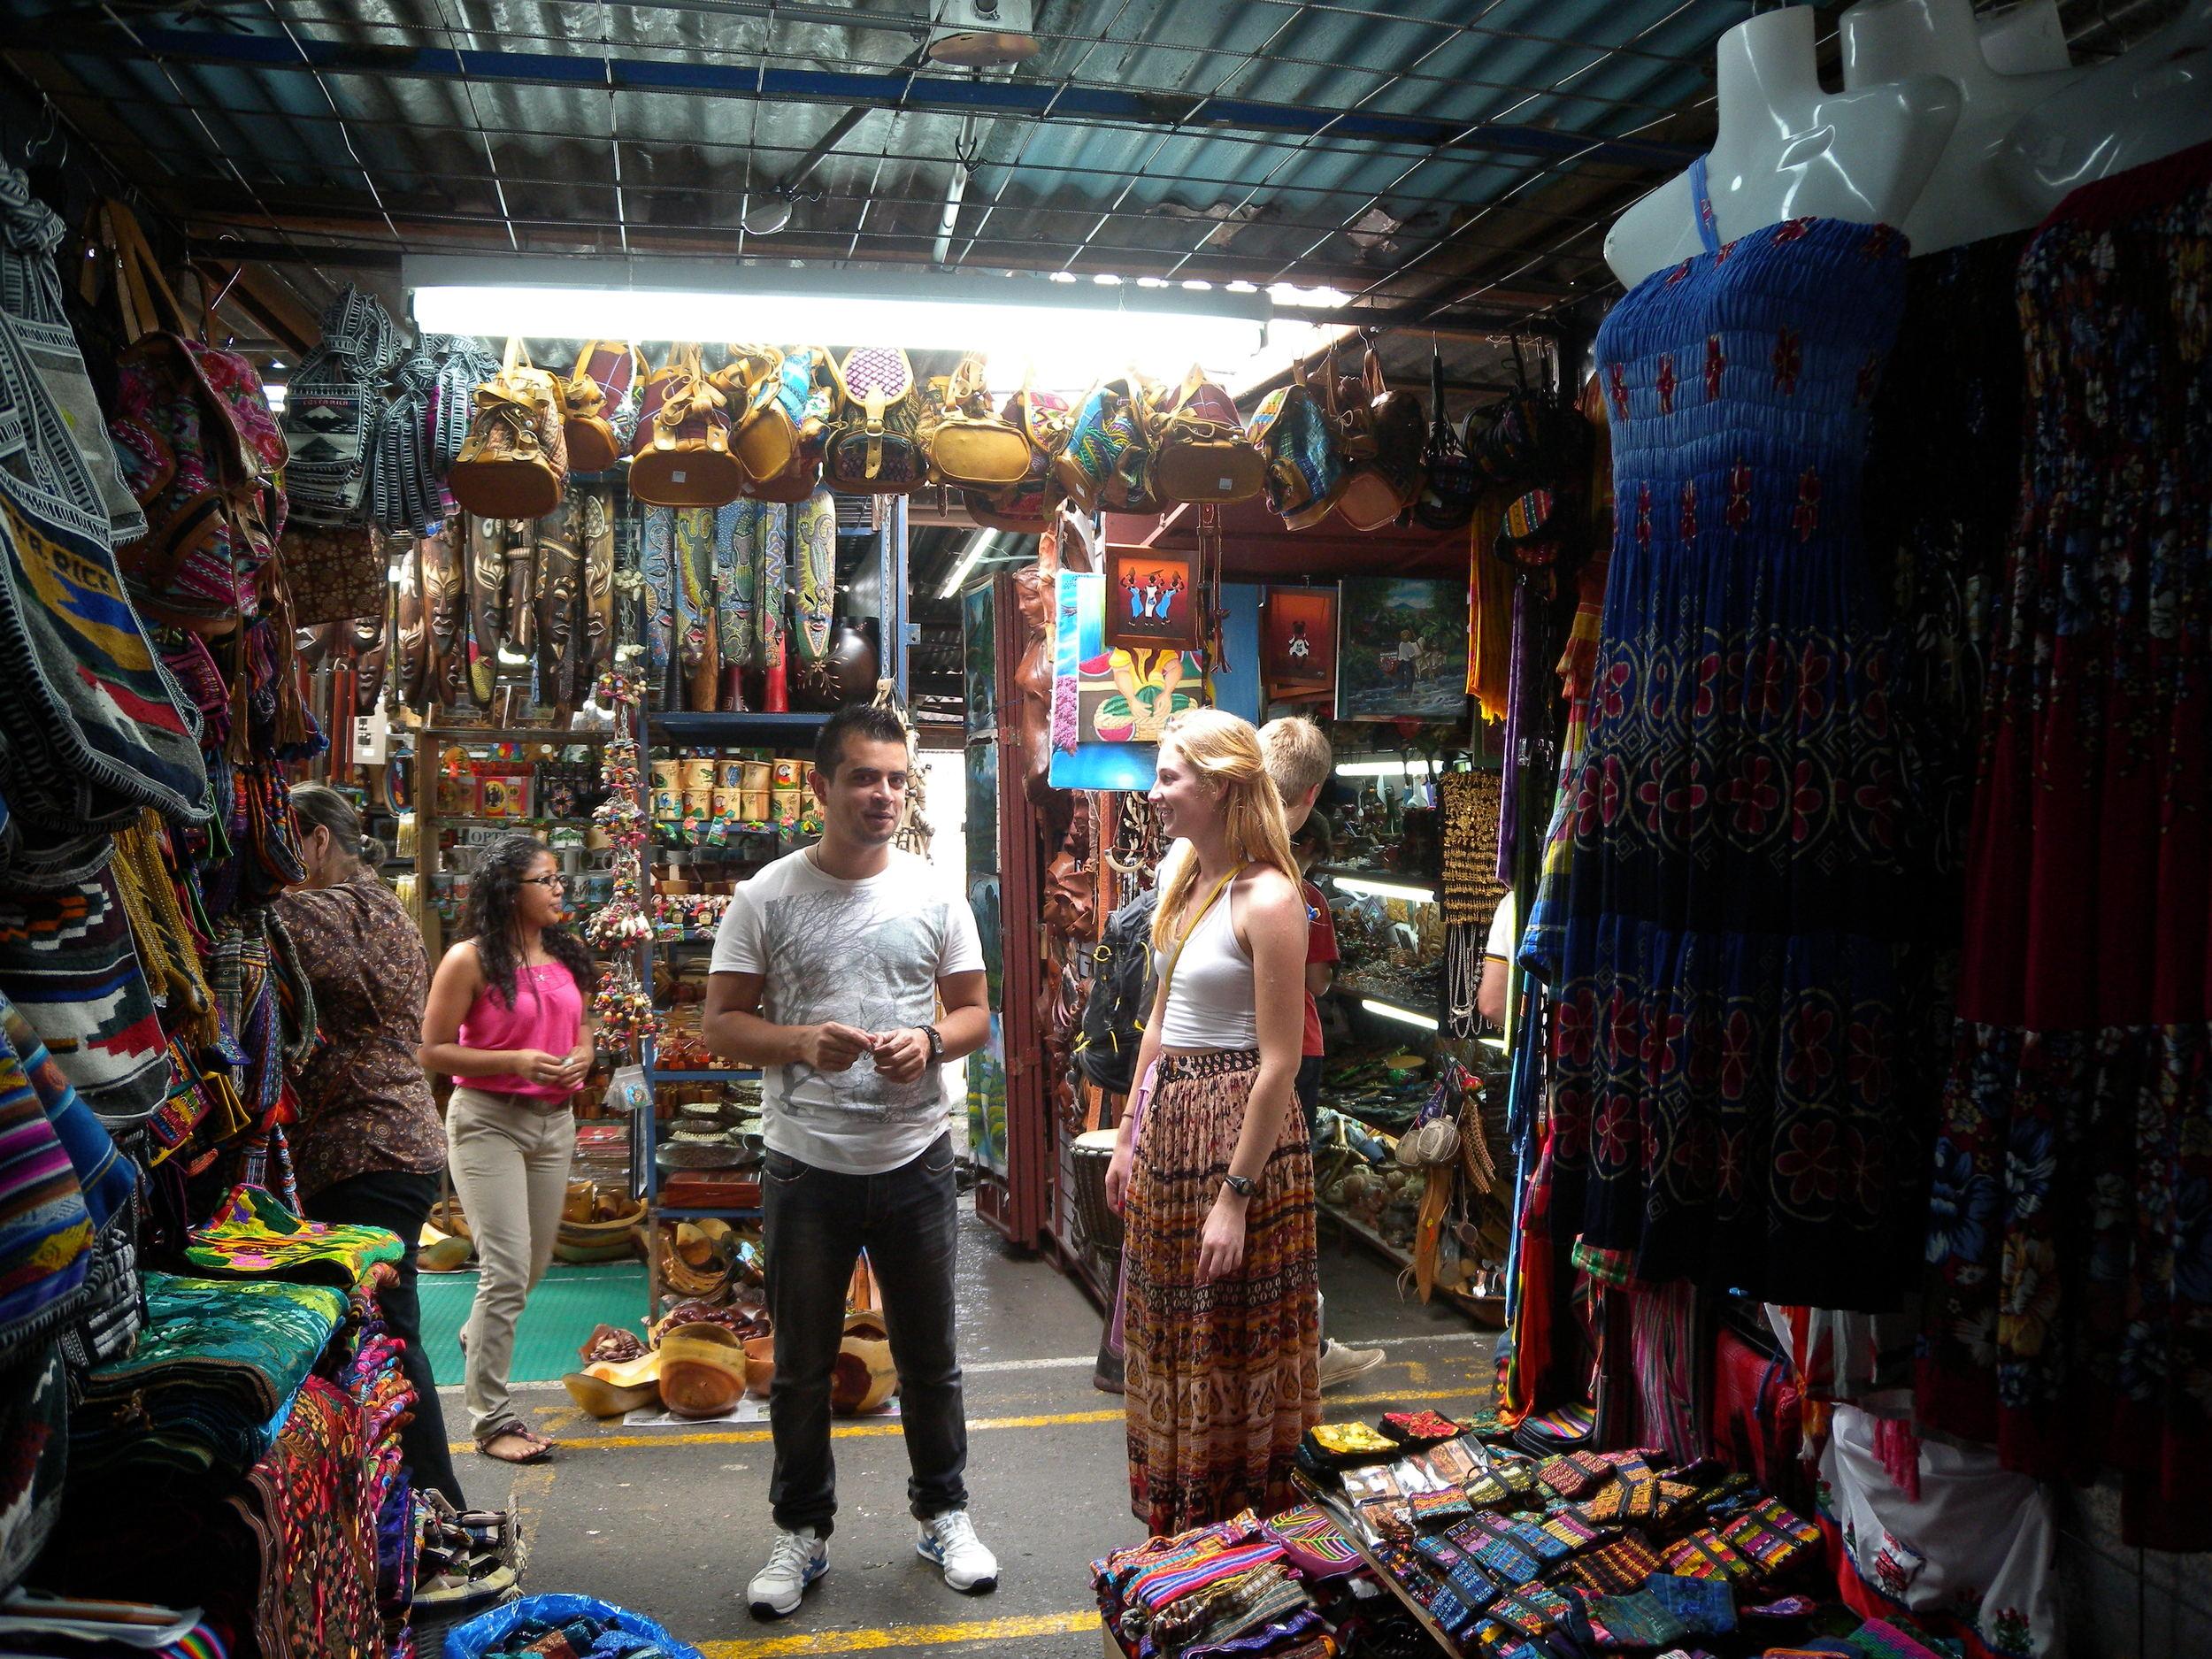 Mercado de Artesanias San José